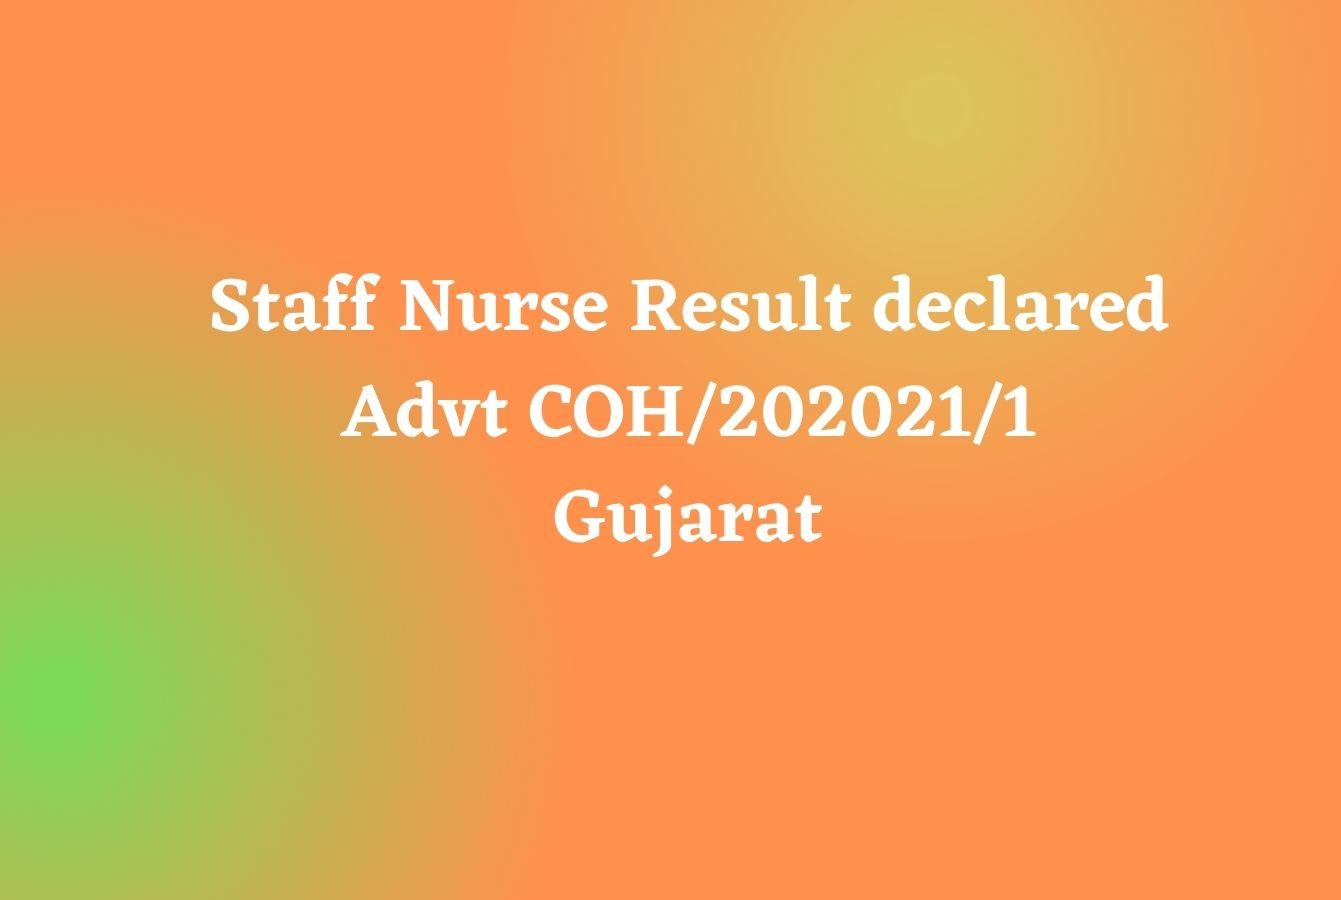 Staff Nurse Result declared Advt COH/202021/1 Gujarat